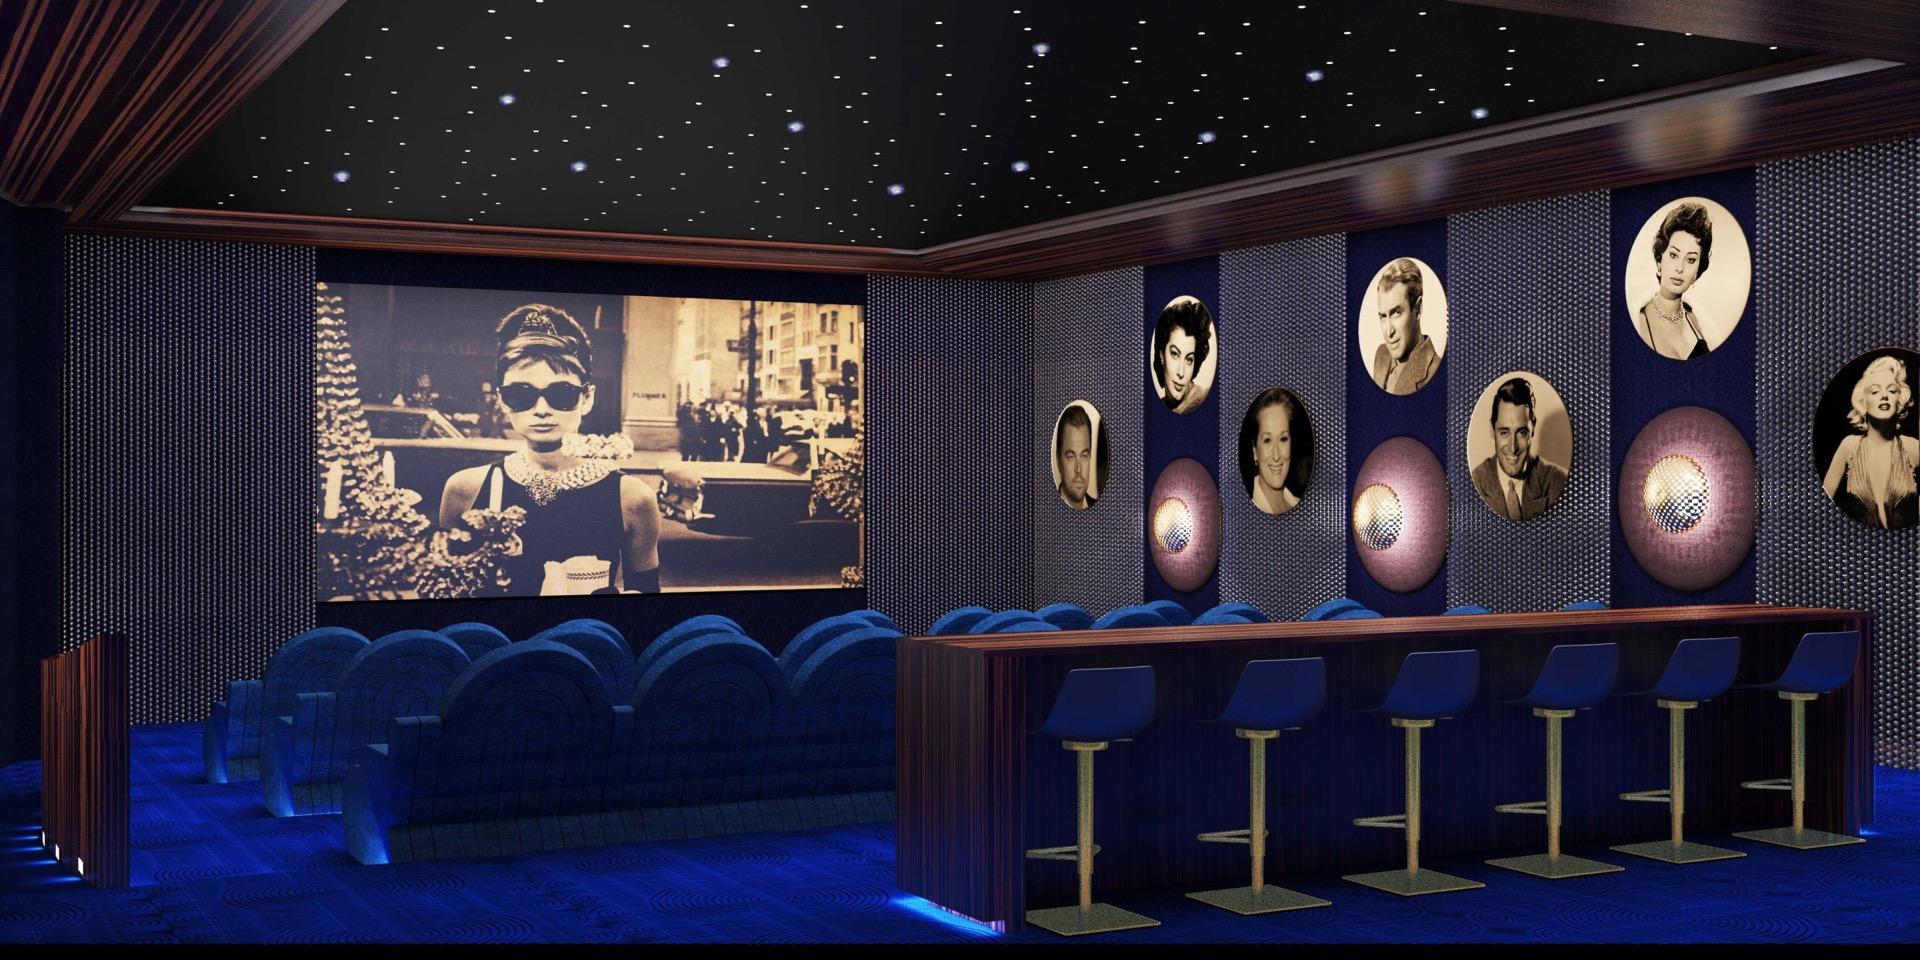 Movie-screening theater image